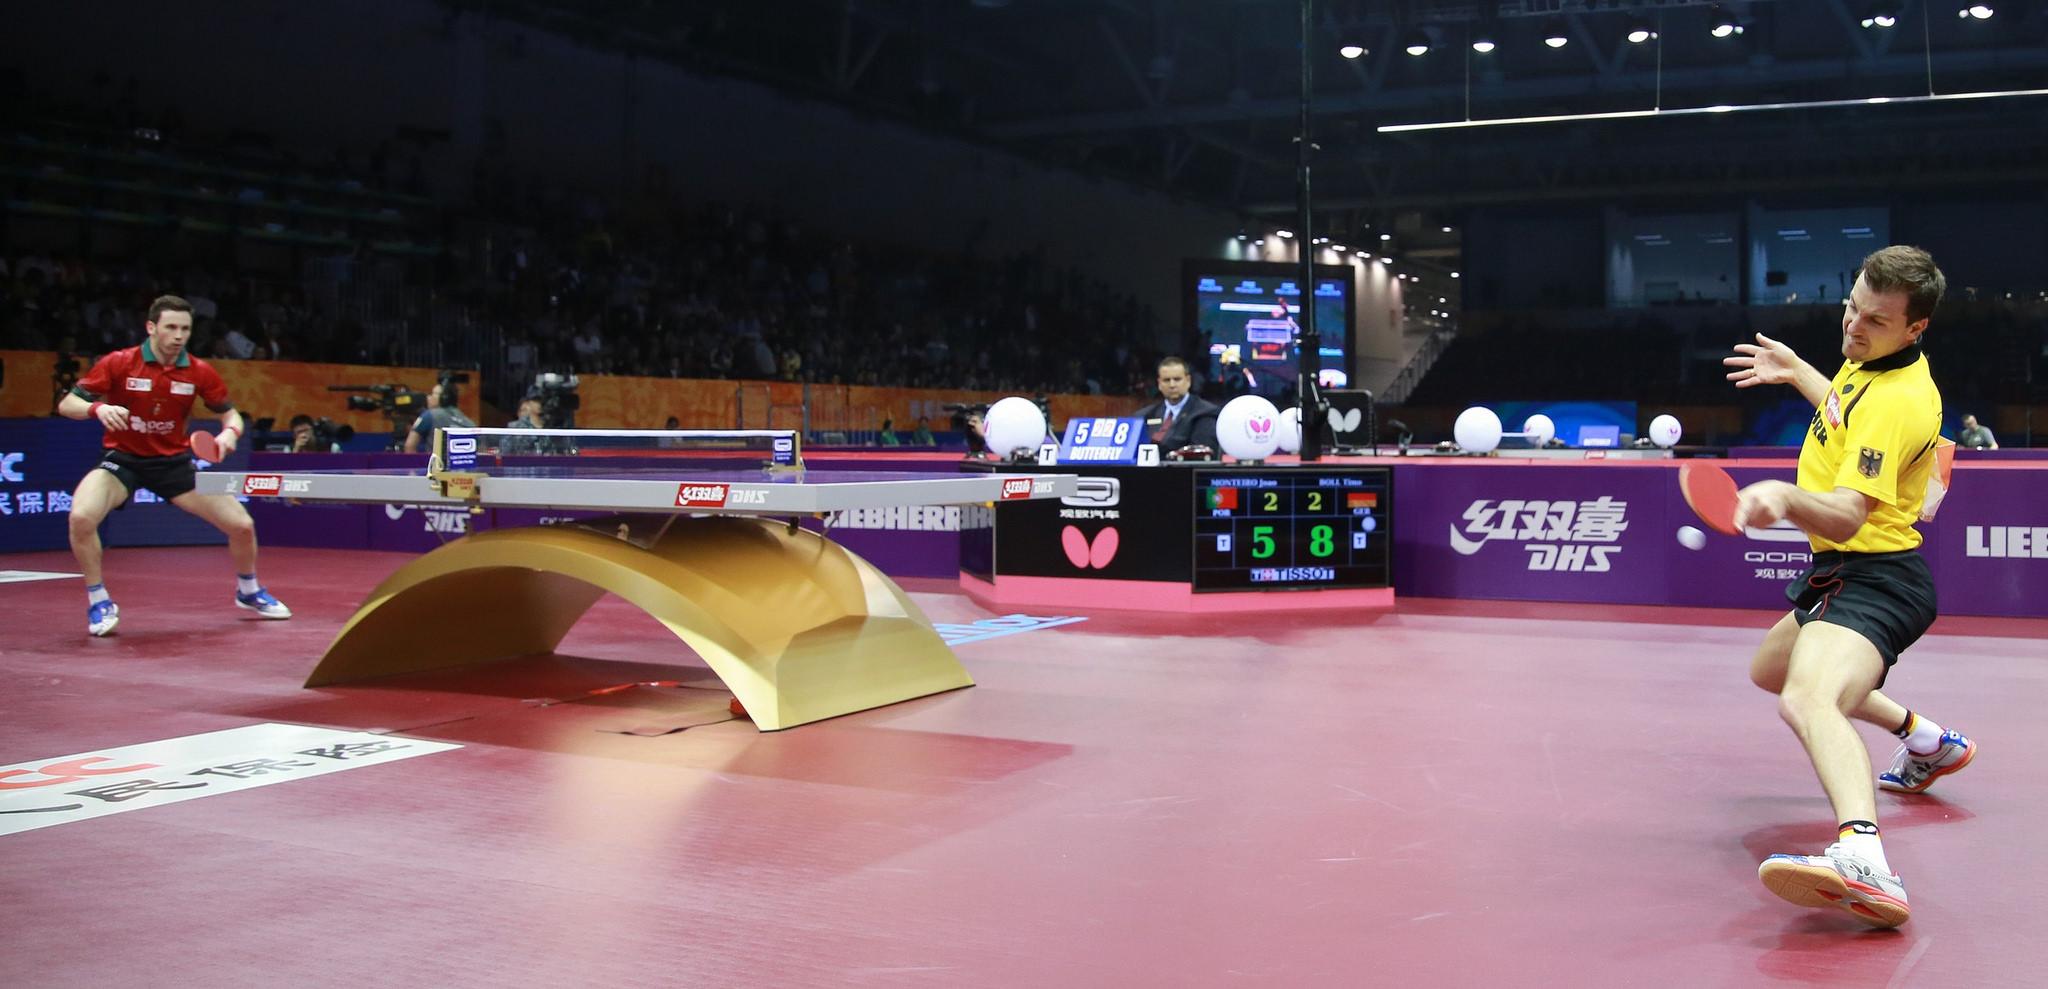 QOROS 2015 World Table Tennis Championships Dia 5